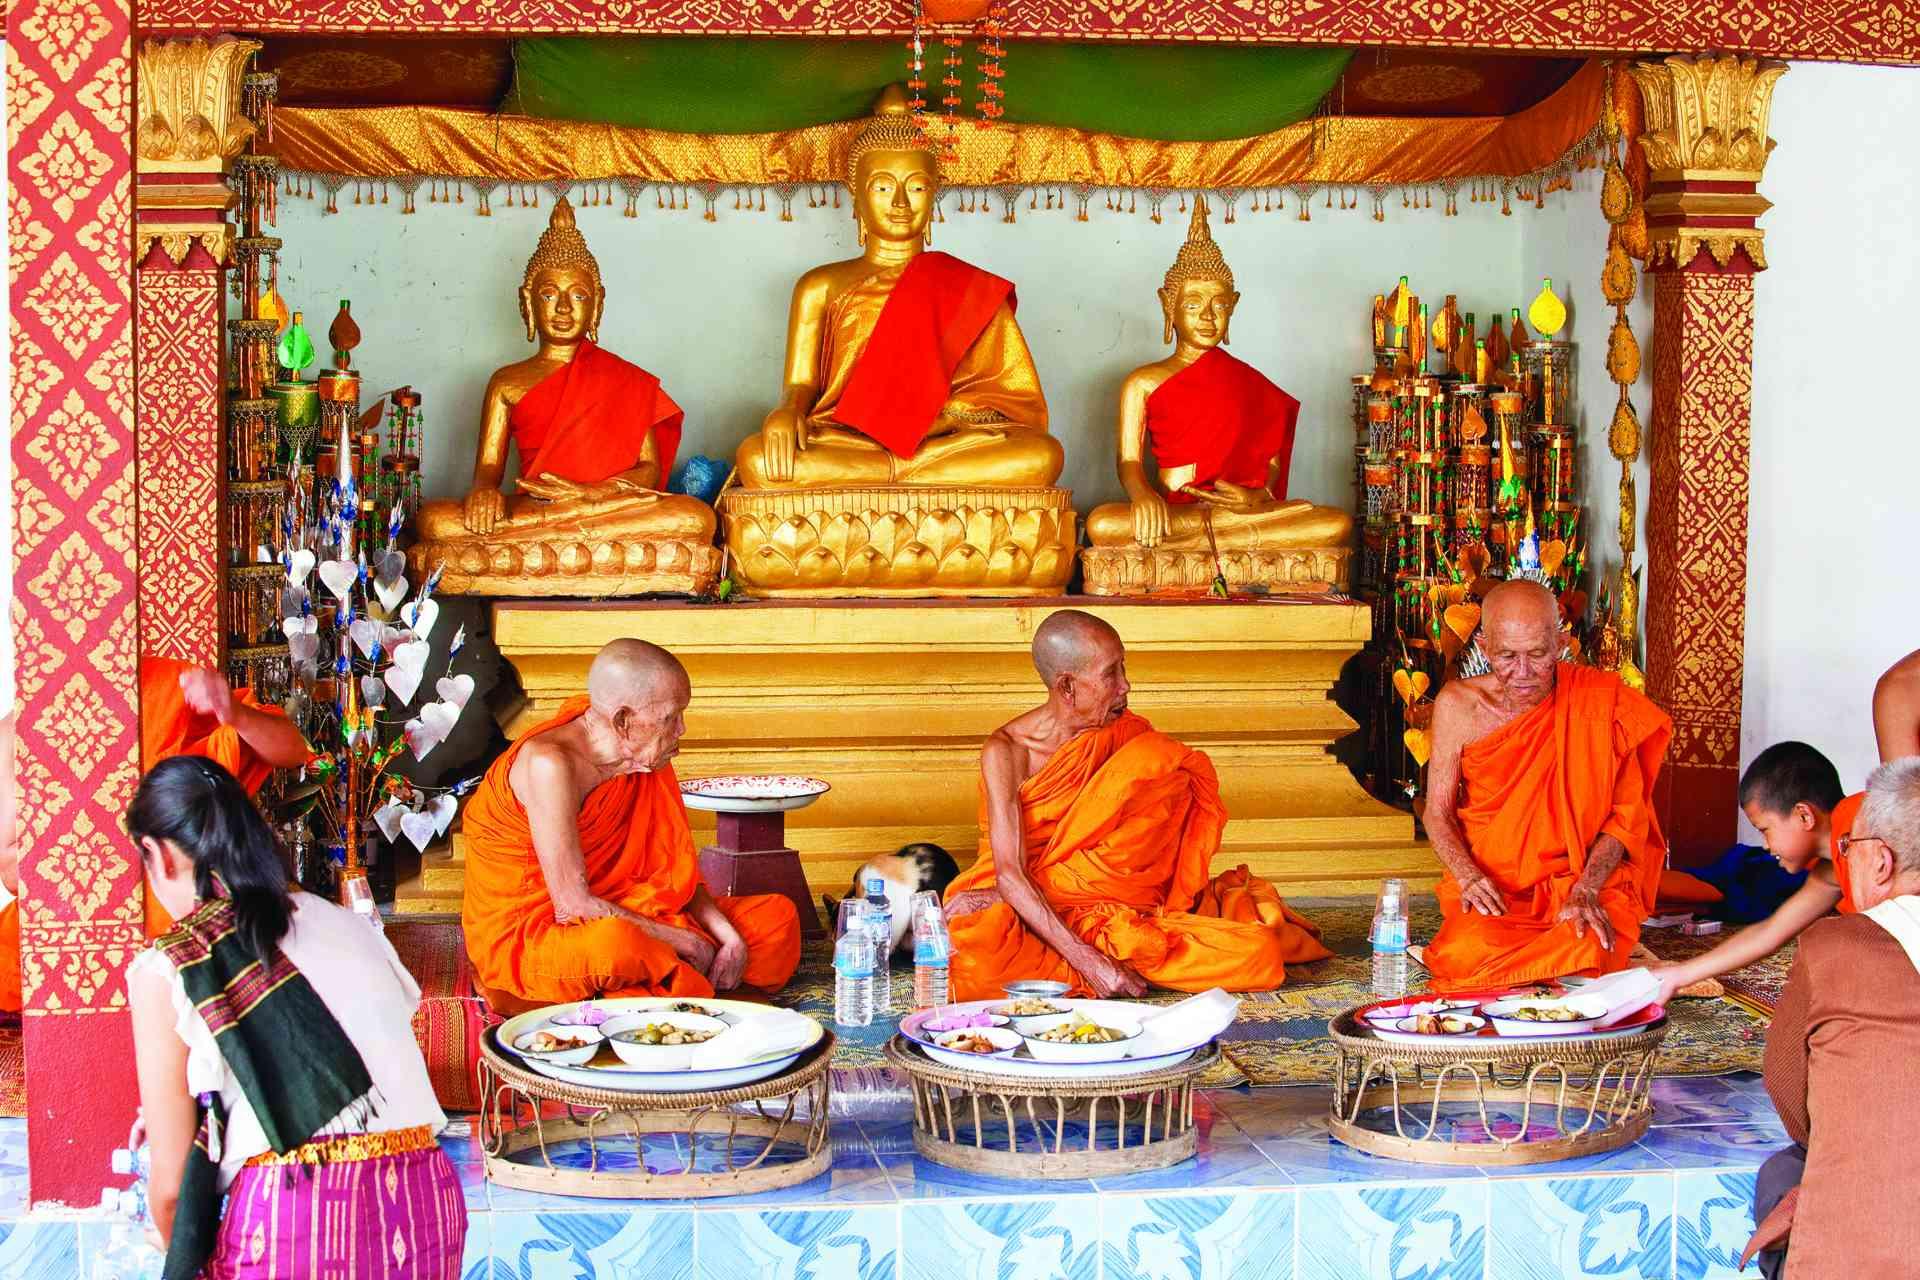 Monks, Luang Prabang, Laos by Graham Meale